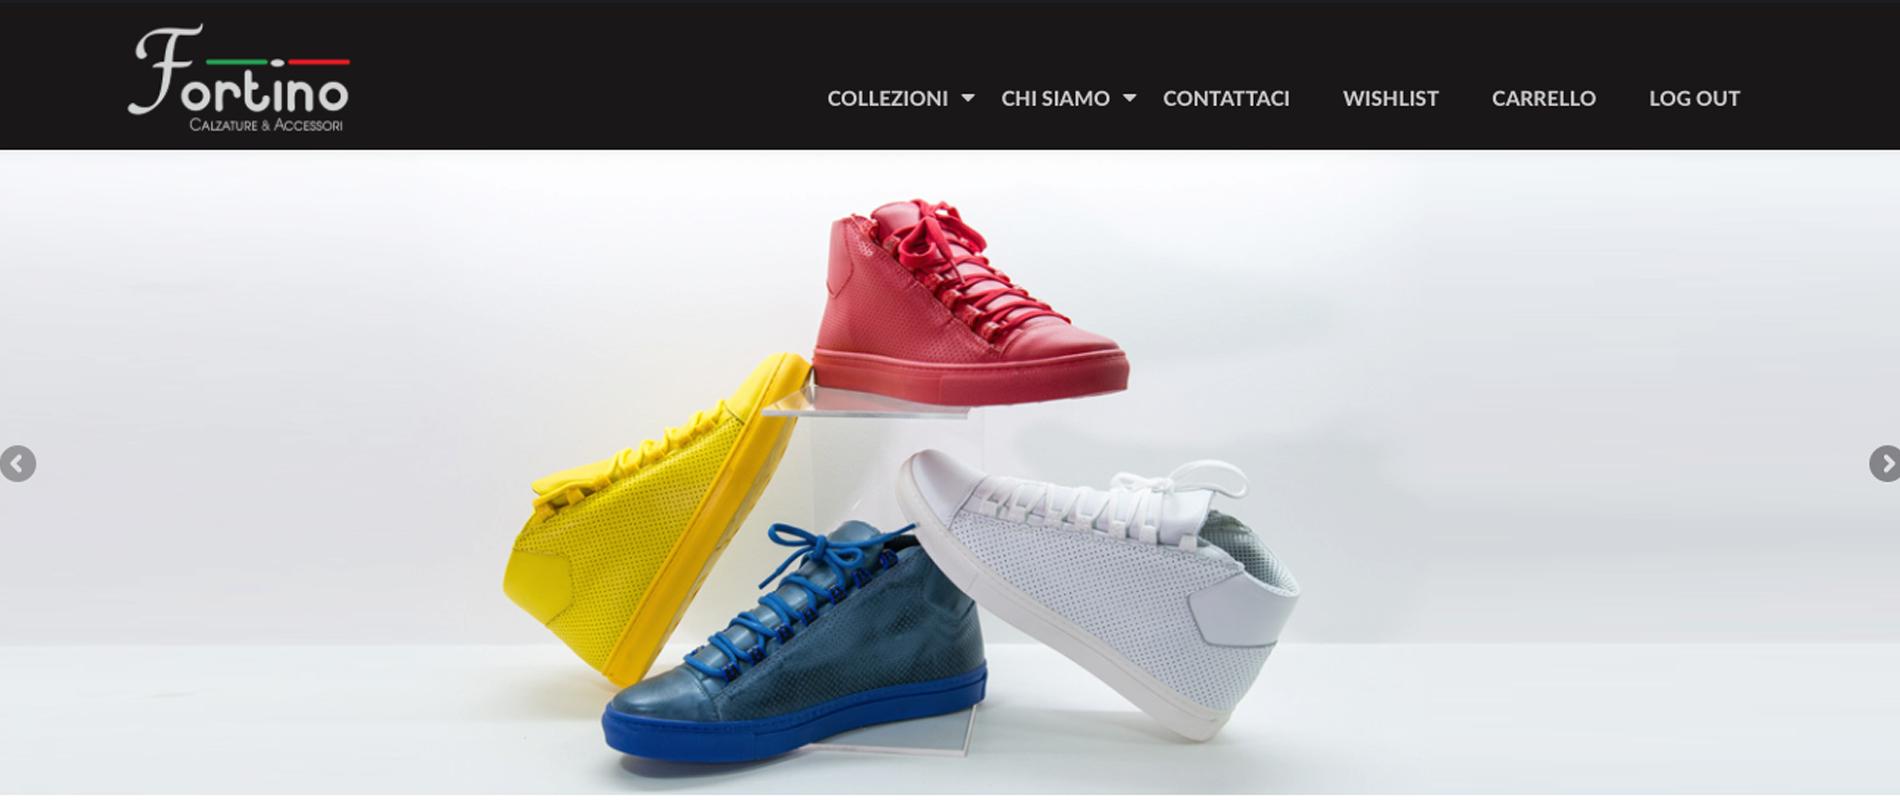 Fortino Calzature - Calzature Uomo Donna Outlet- Cosenza - Rende - scarpe